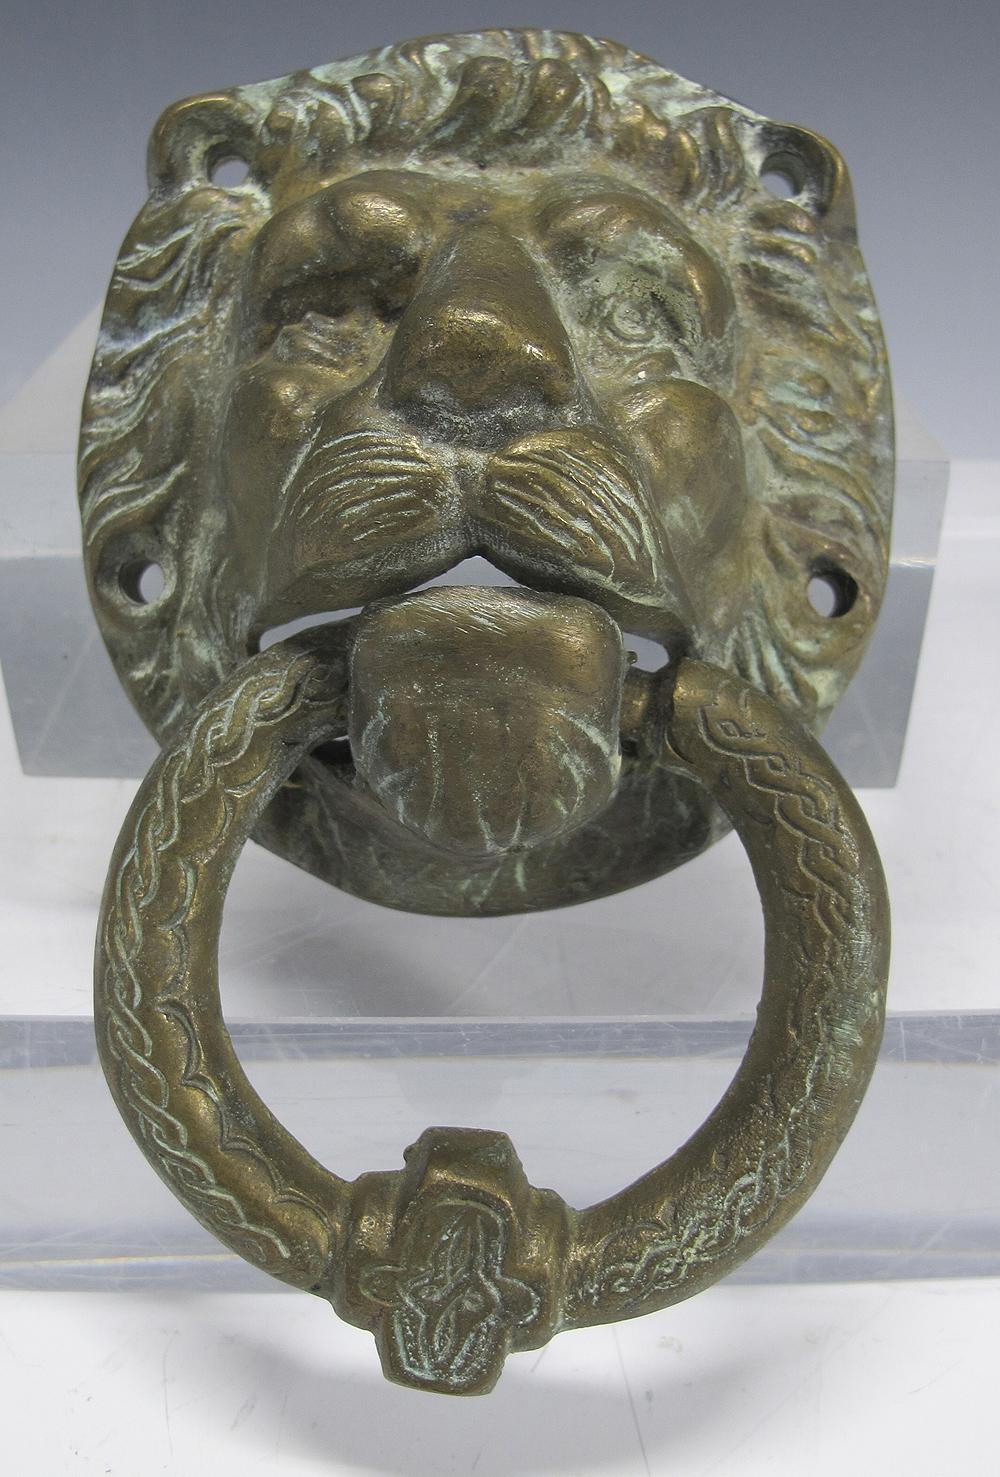 Antique 19th c solid heavy cast brass bronze figural lions head door knocker yqz ebay - Antique brass lion head door knocker ...